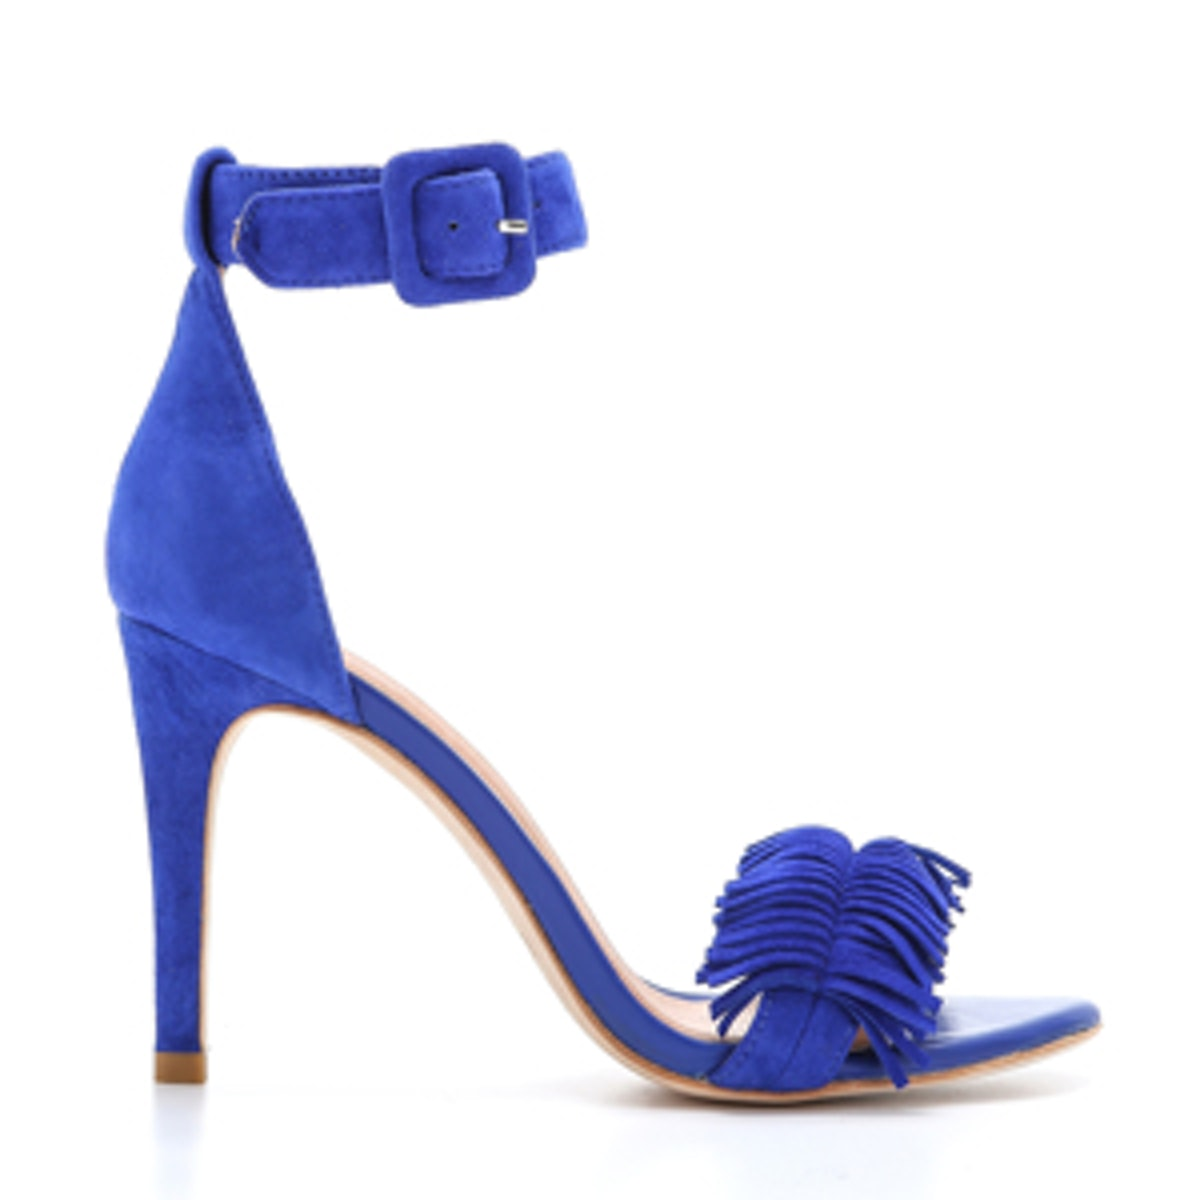 Pippi Fringe Sandals